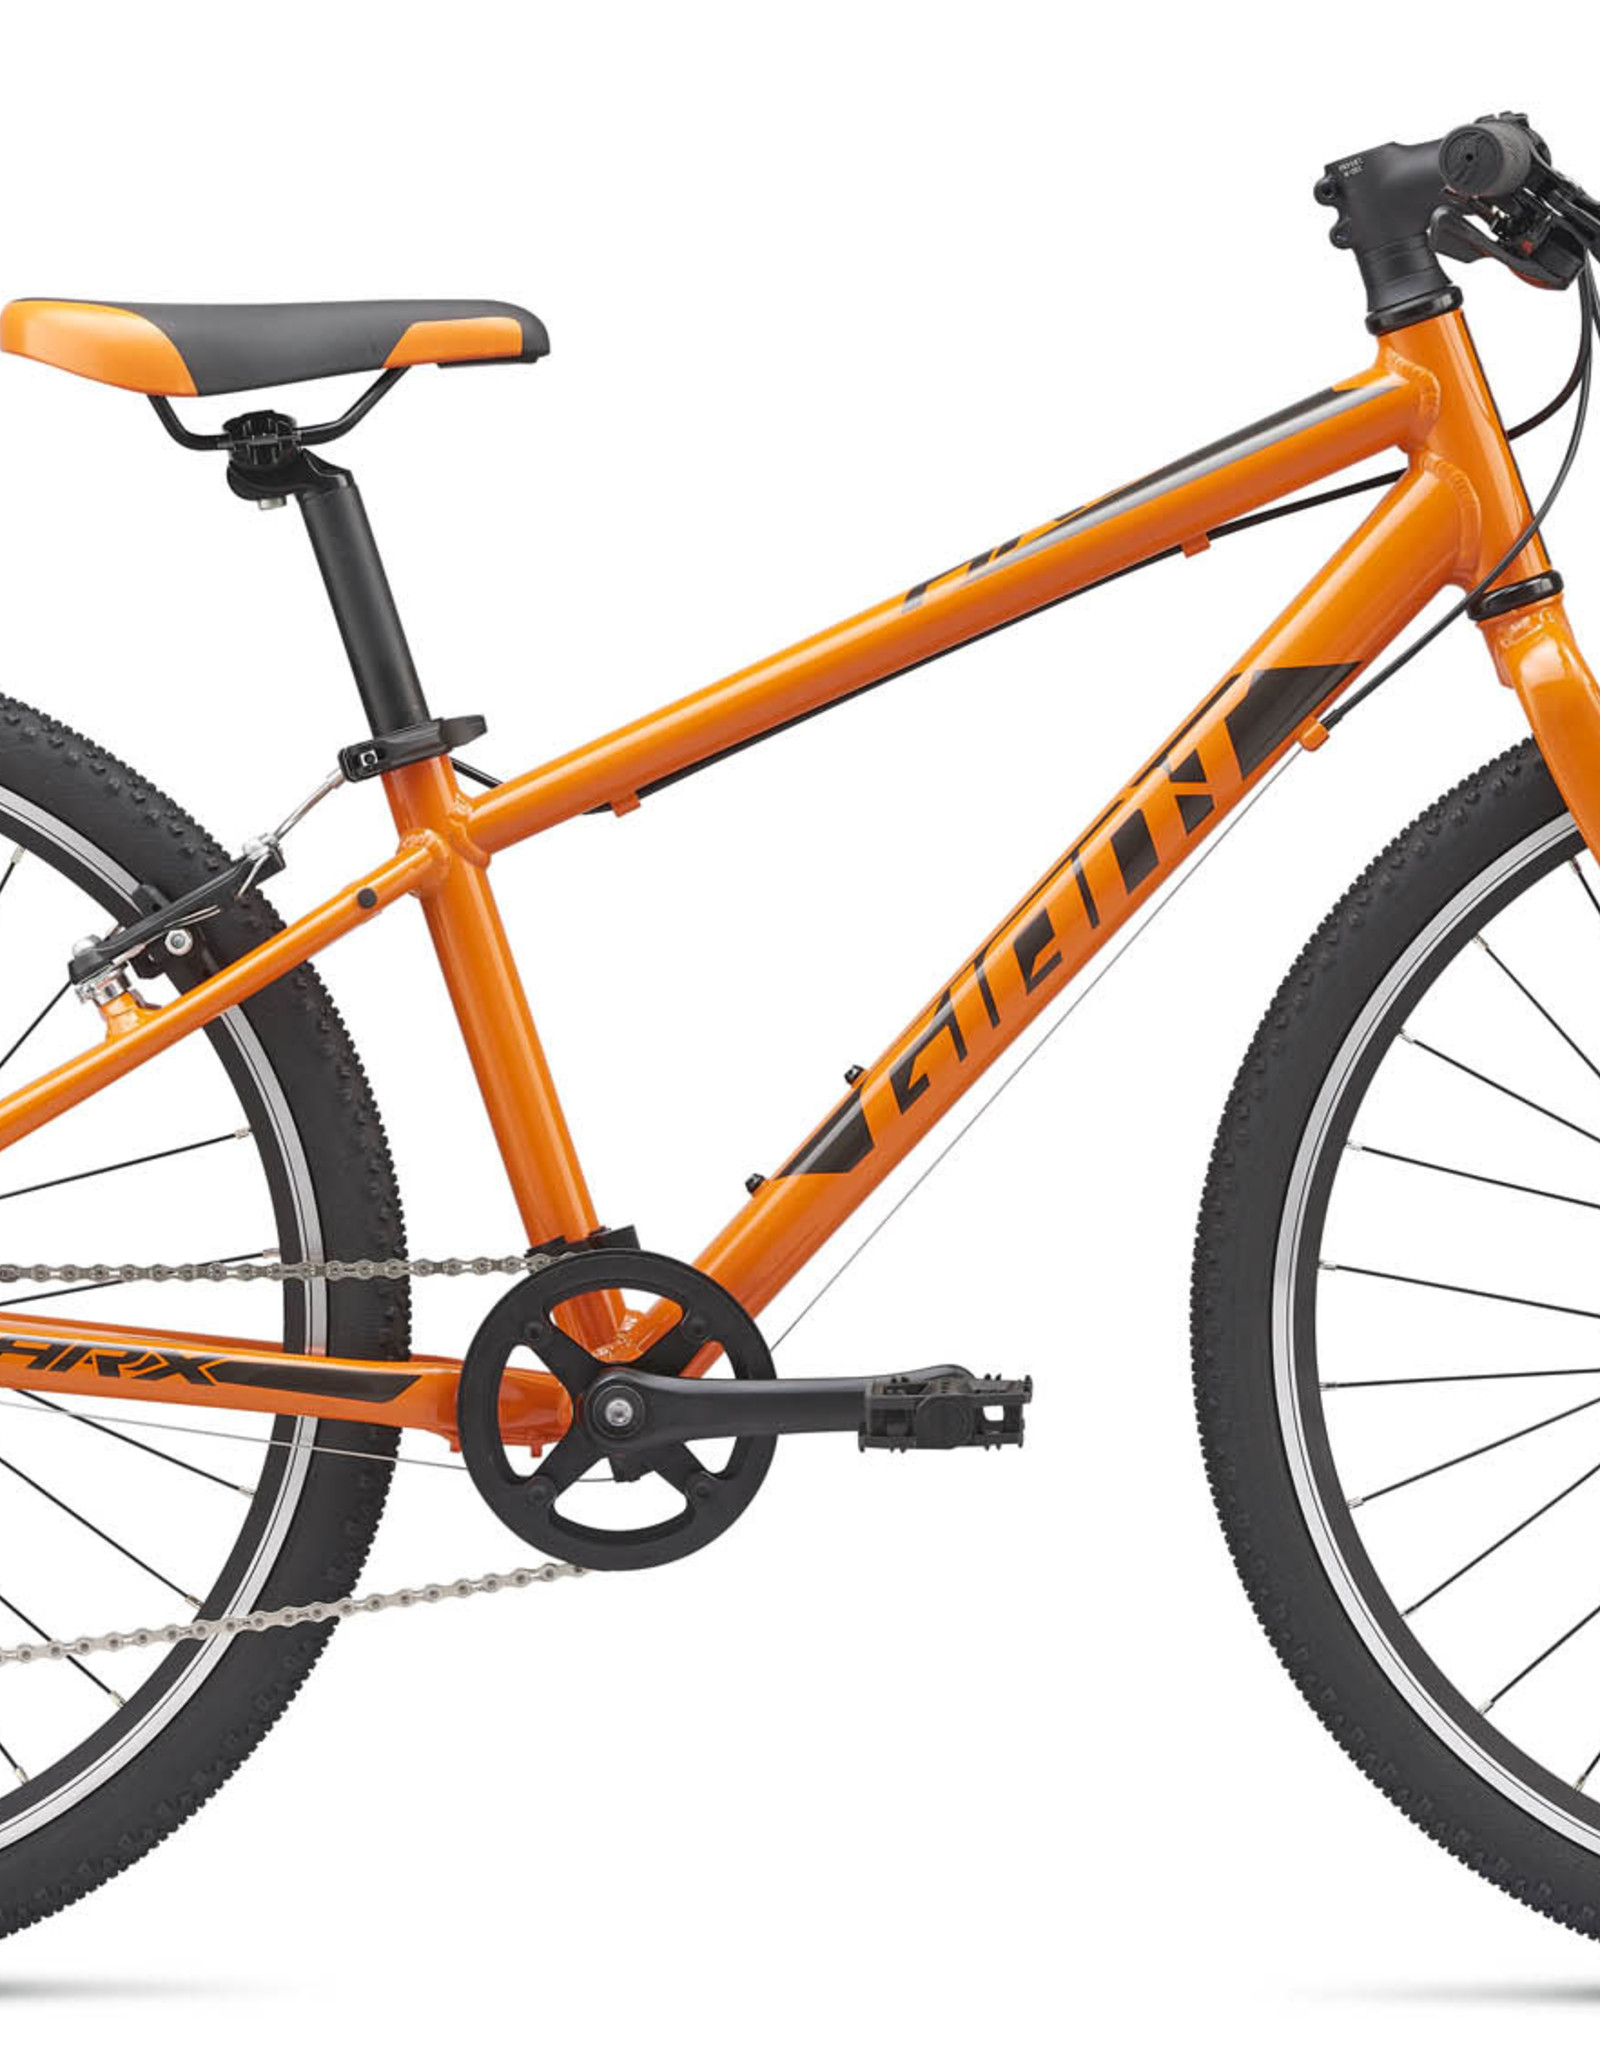 Giant 2021 Giant Arx 24 ( orange )